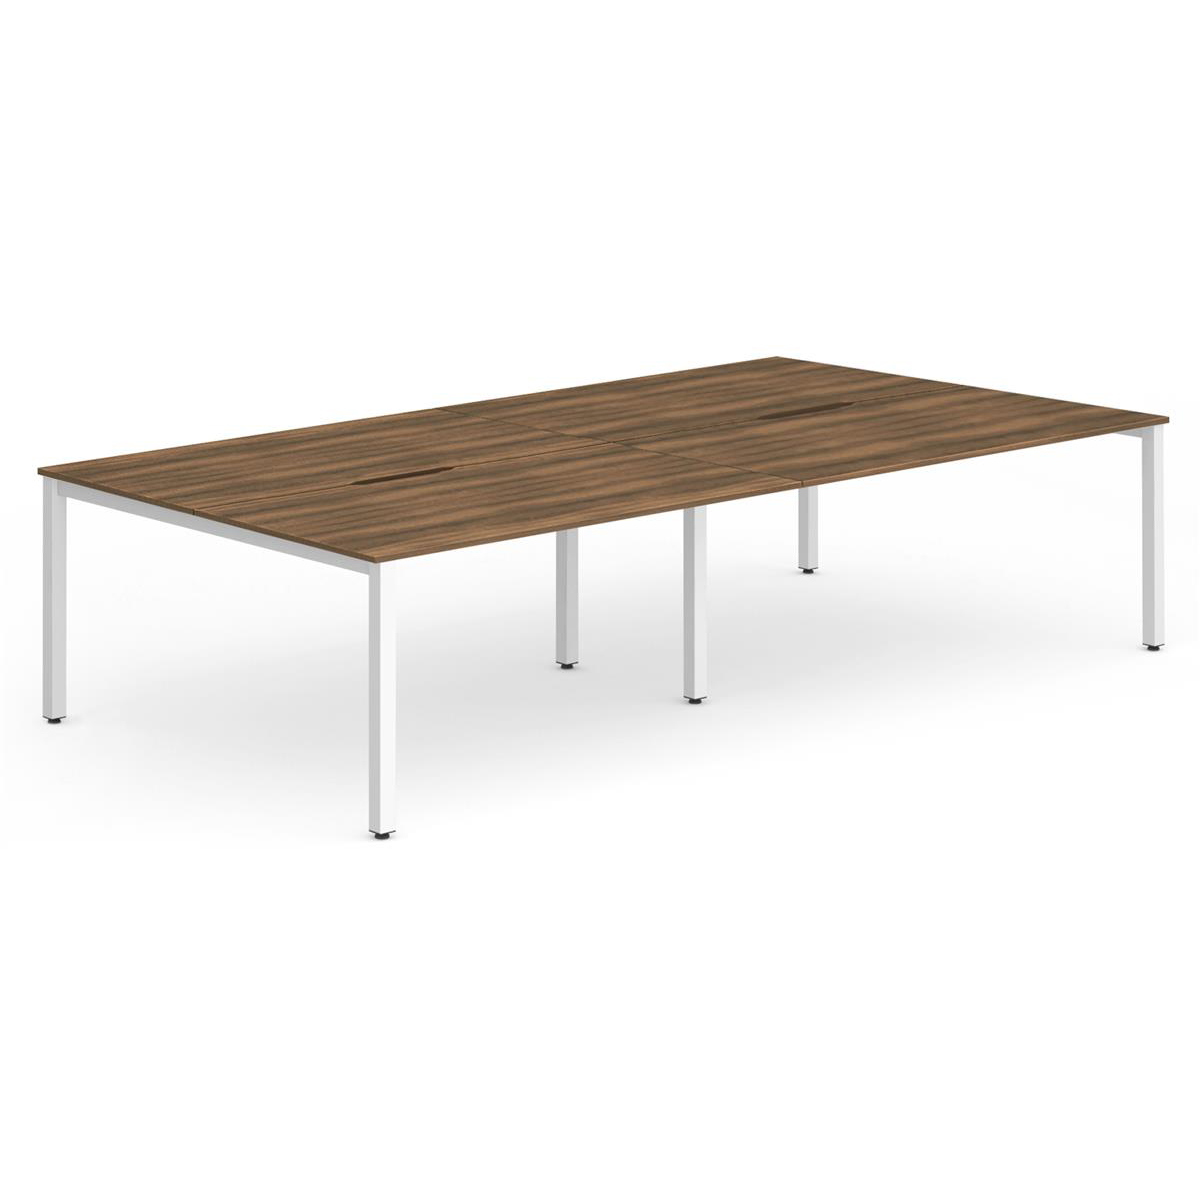 Trexus Bench Desk 4 Person Back to Back Configuration White Leg 3200x1600mm Walnut Ref BE229